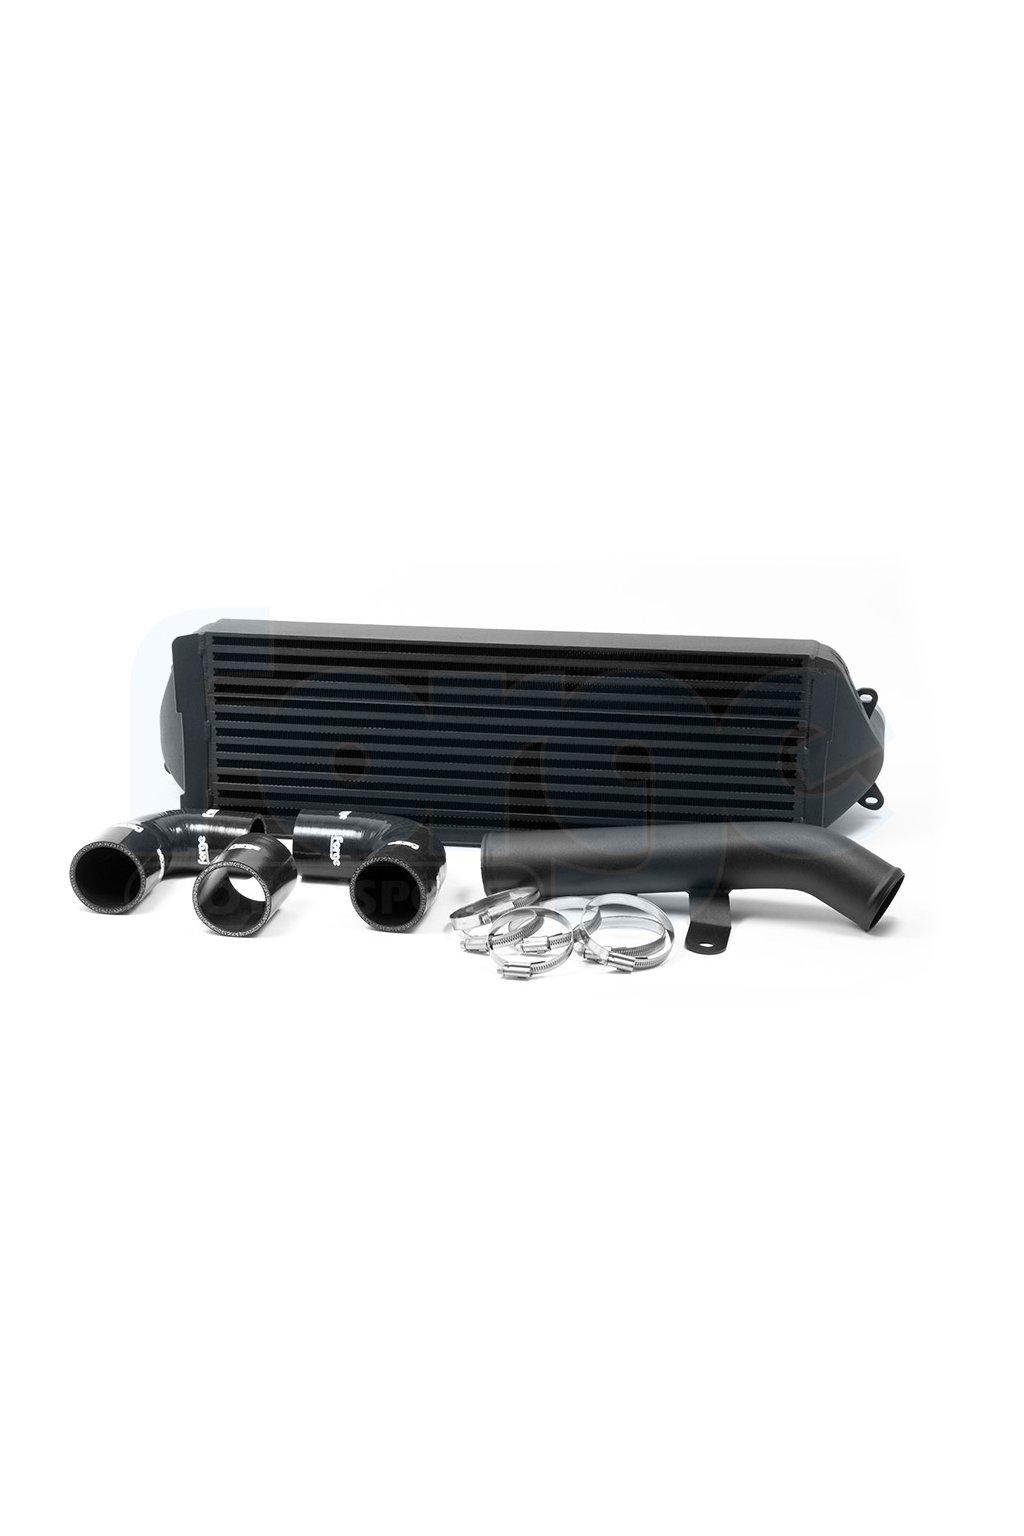 Uprated Intercooler for Hyundai i30n 41005jpeg